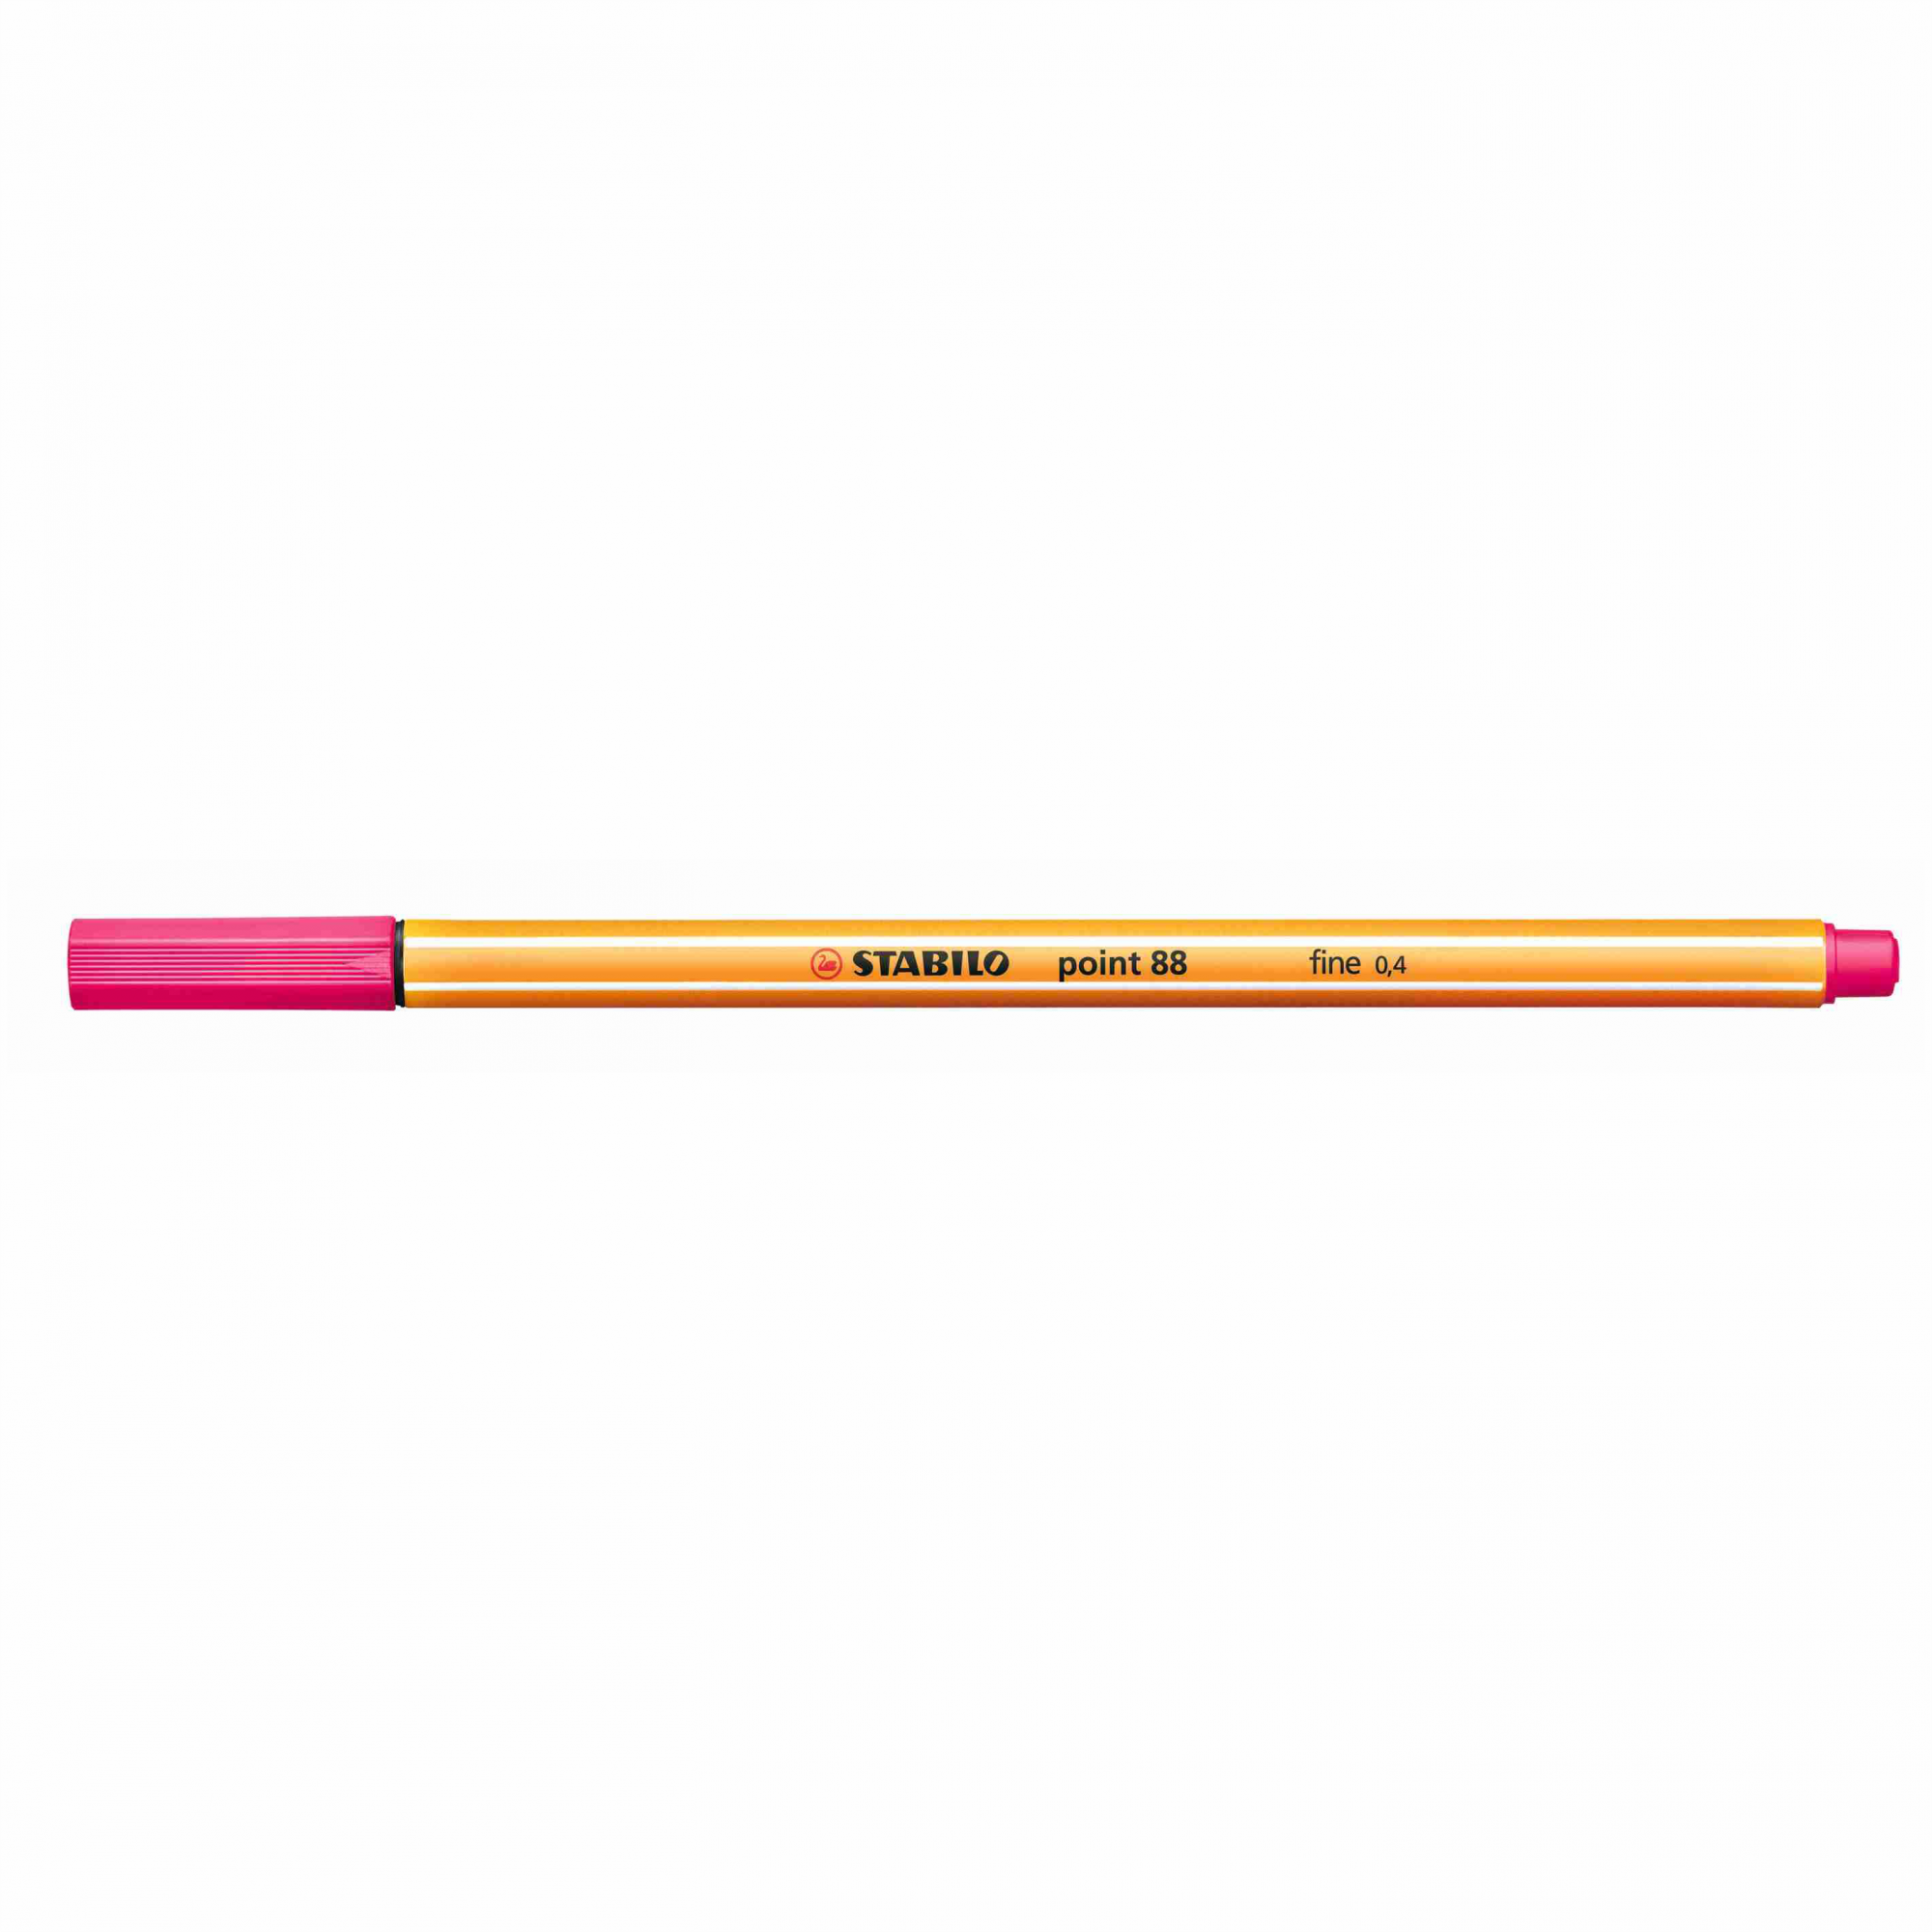 Caneta Hidrográfica 0.4 rosa POINT 88 Stabilo